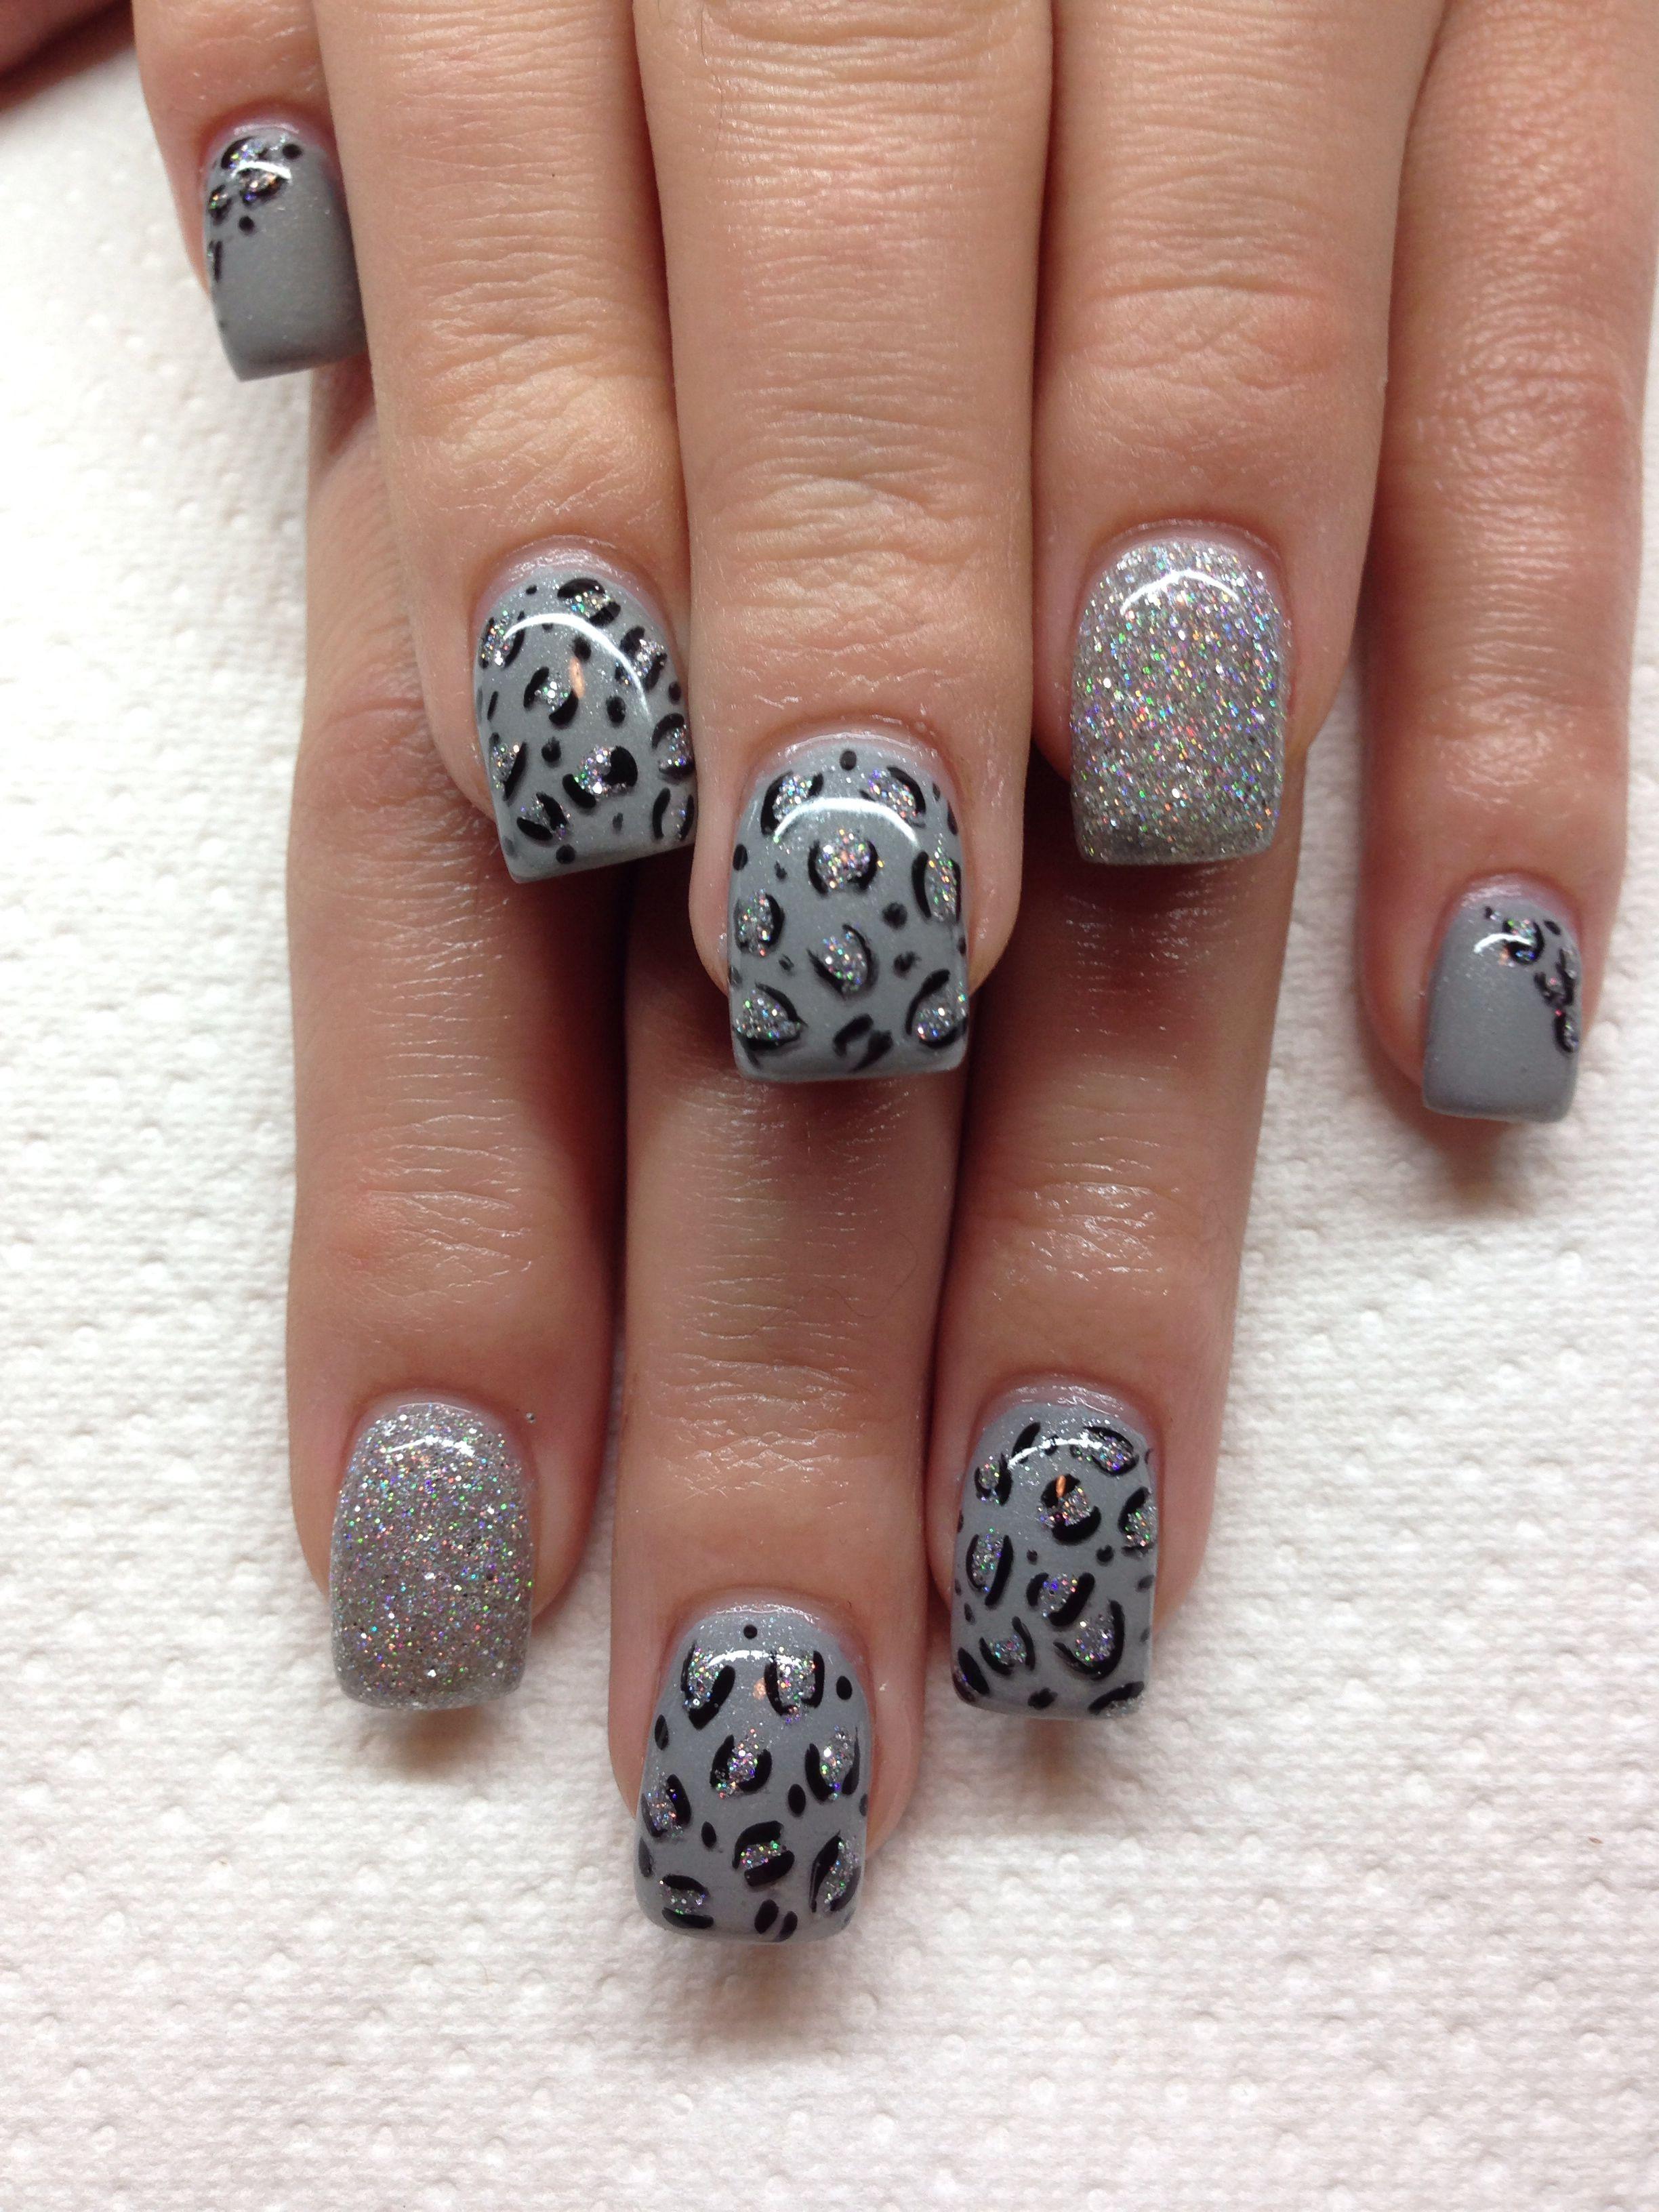 33 Earthy and Stylish Fall Nail Art Ideas | Pinterest | Hand drawn ...